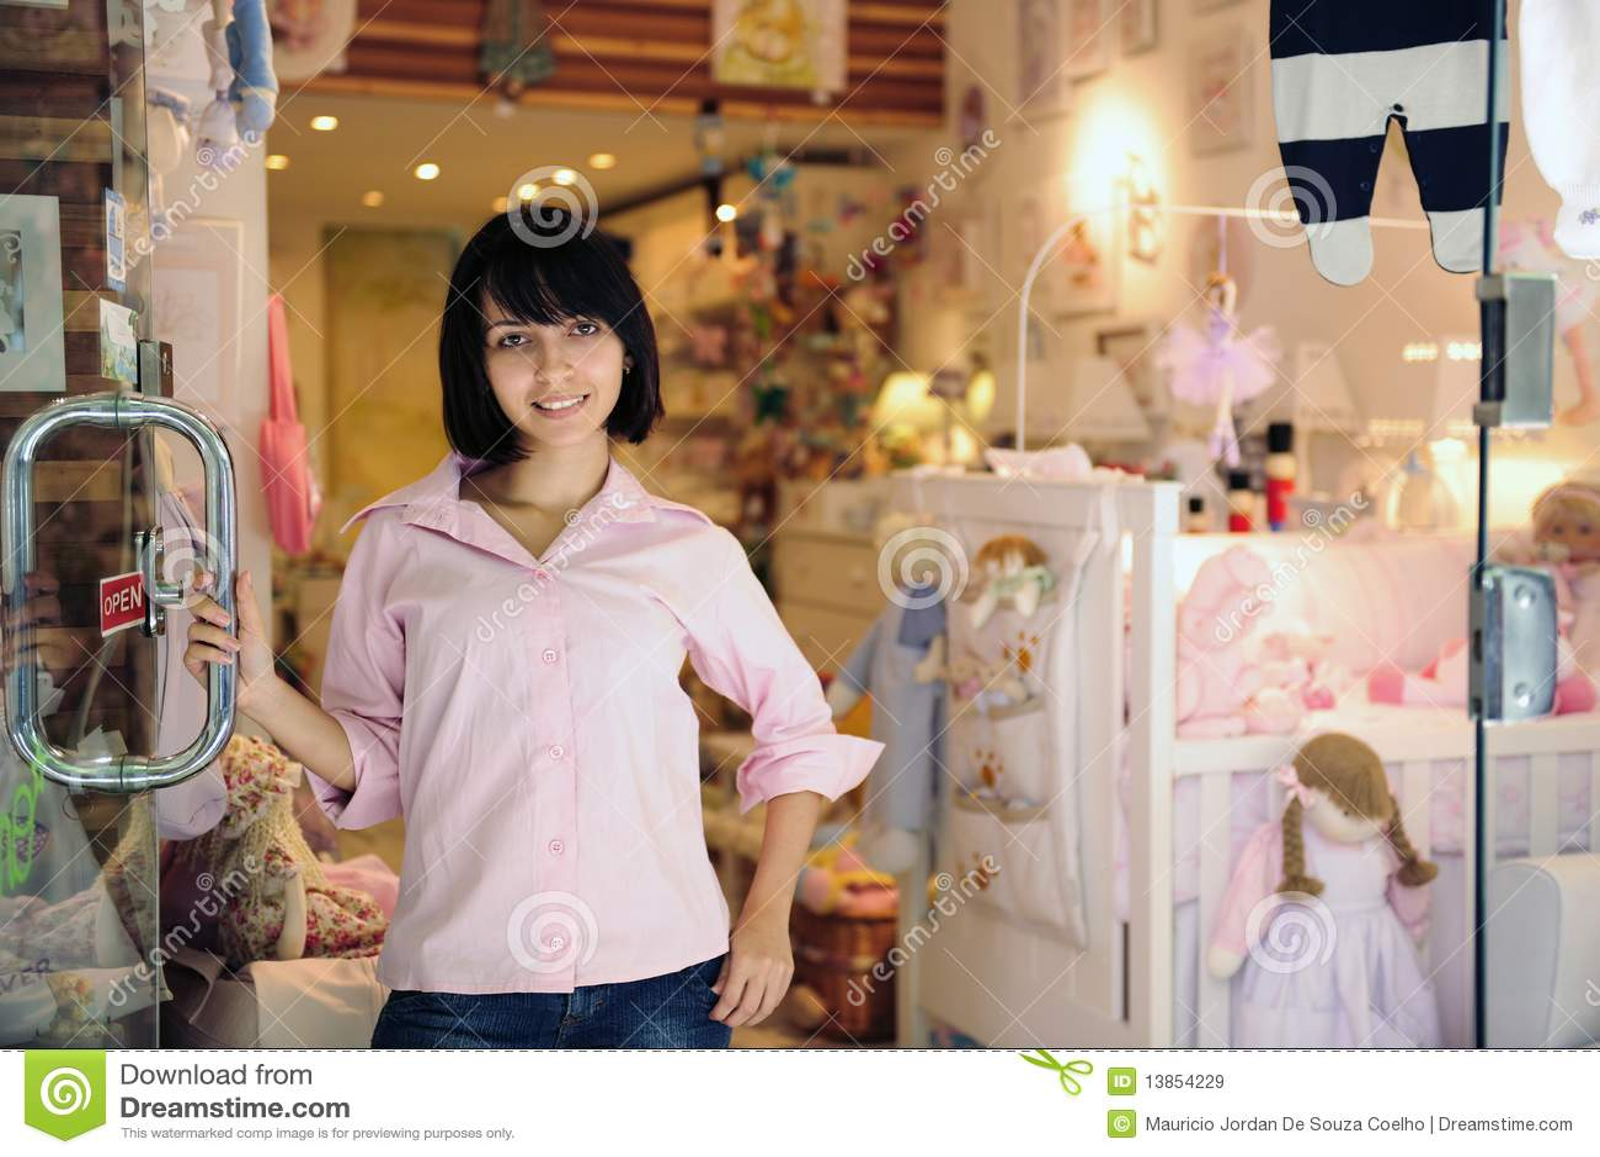 Baby shop business plan free